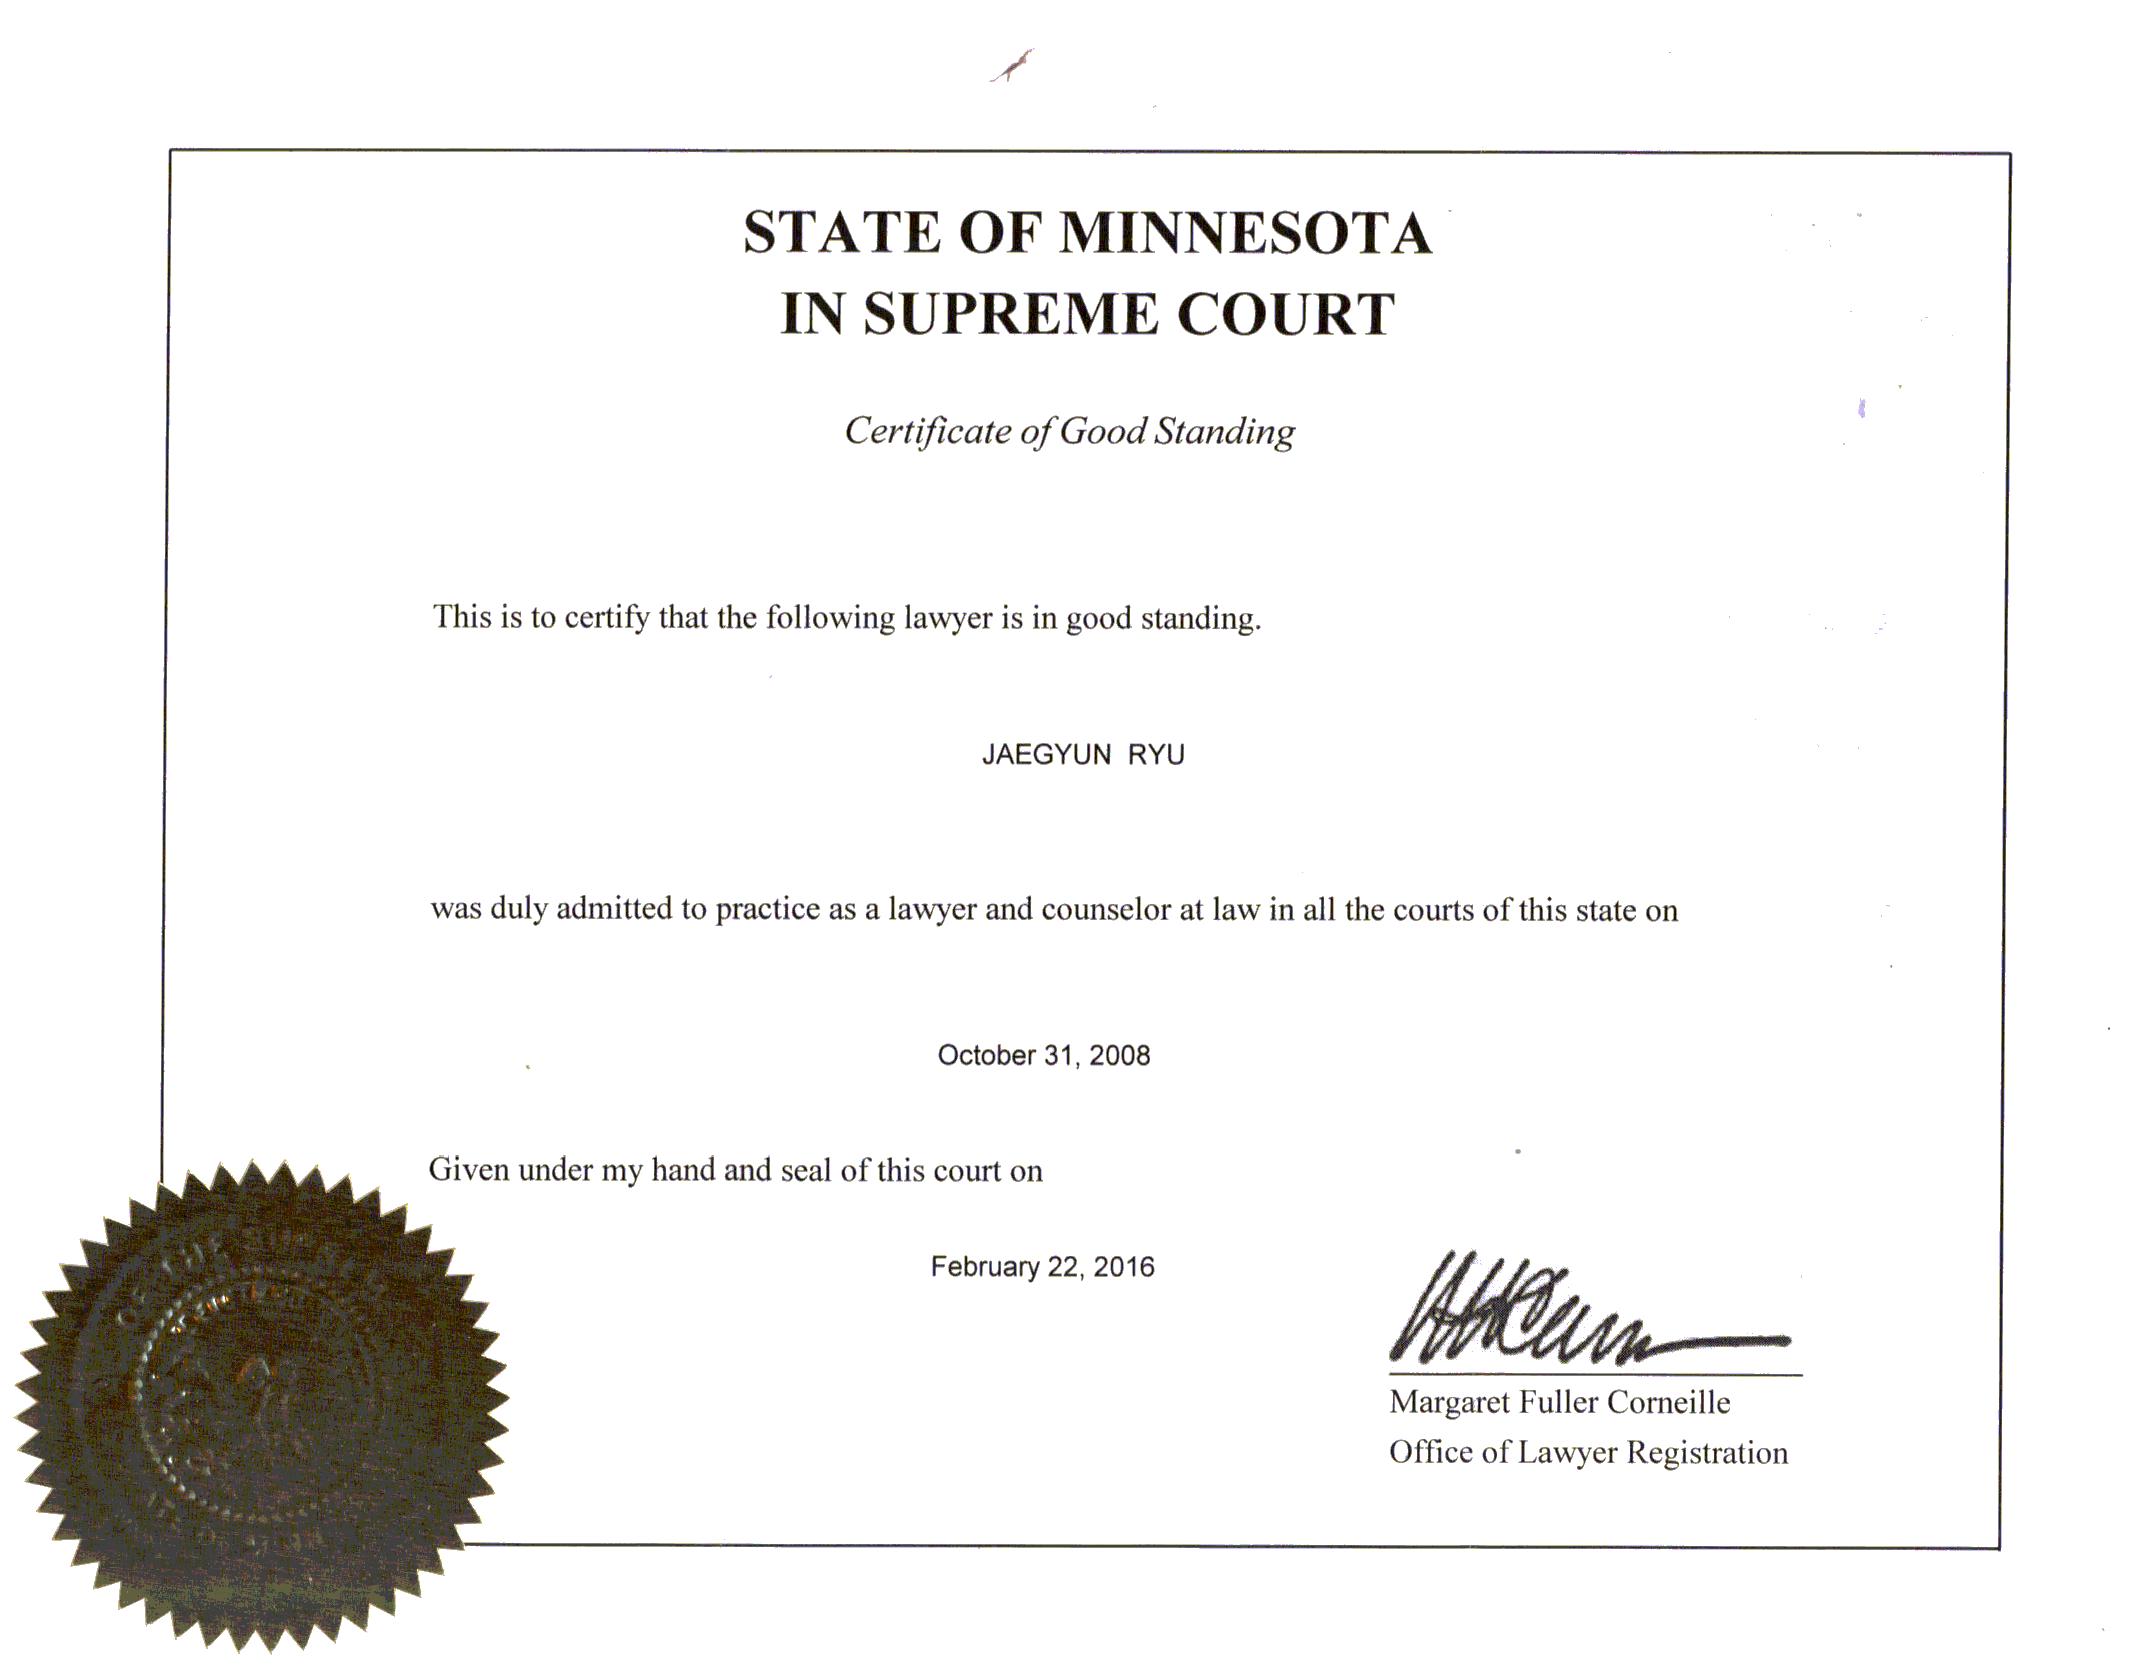 MN certificate